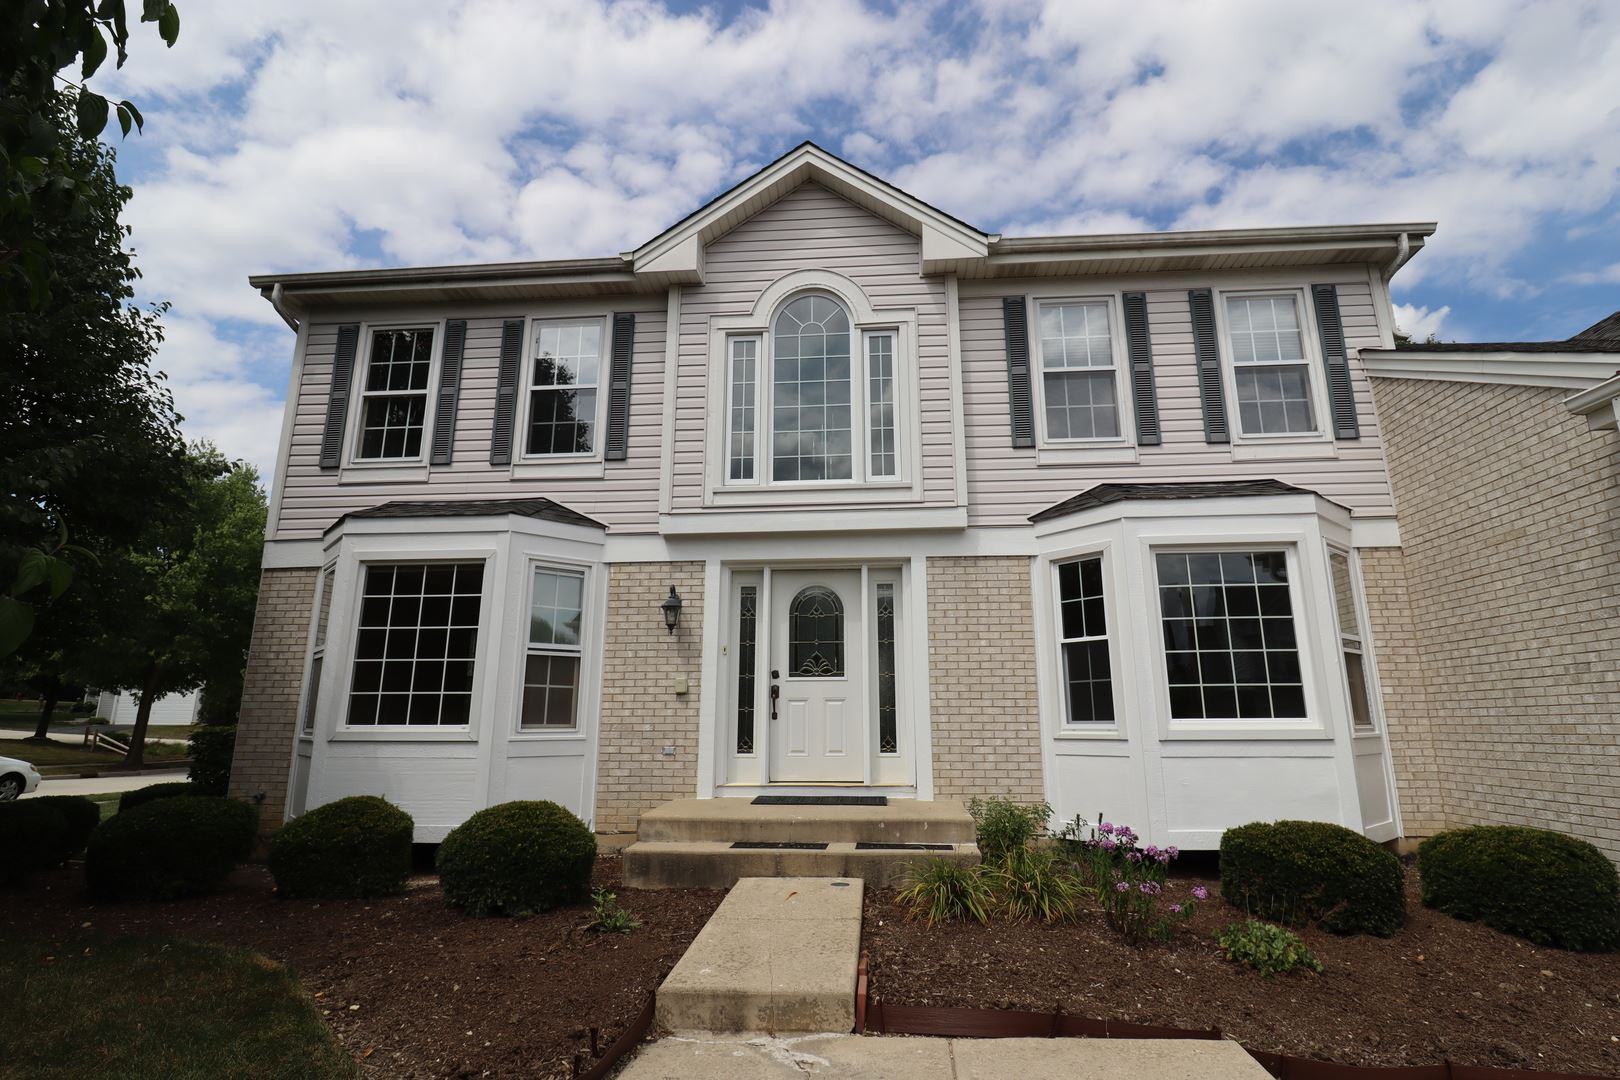 1613 Mccormack Drive, Hoffman Estates, IL 60169 - #: 10805213